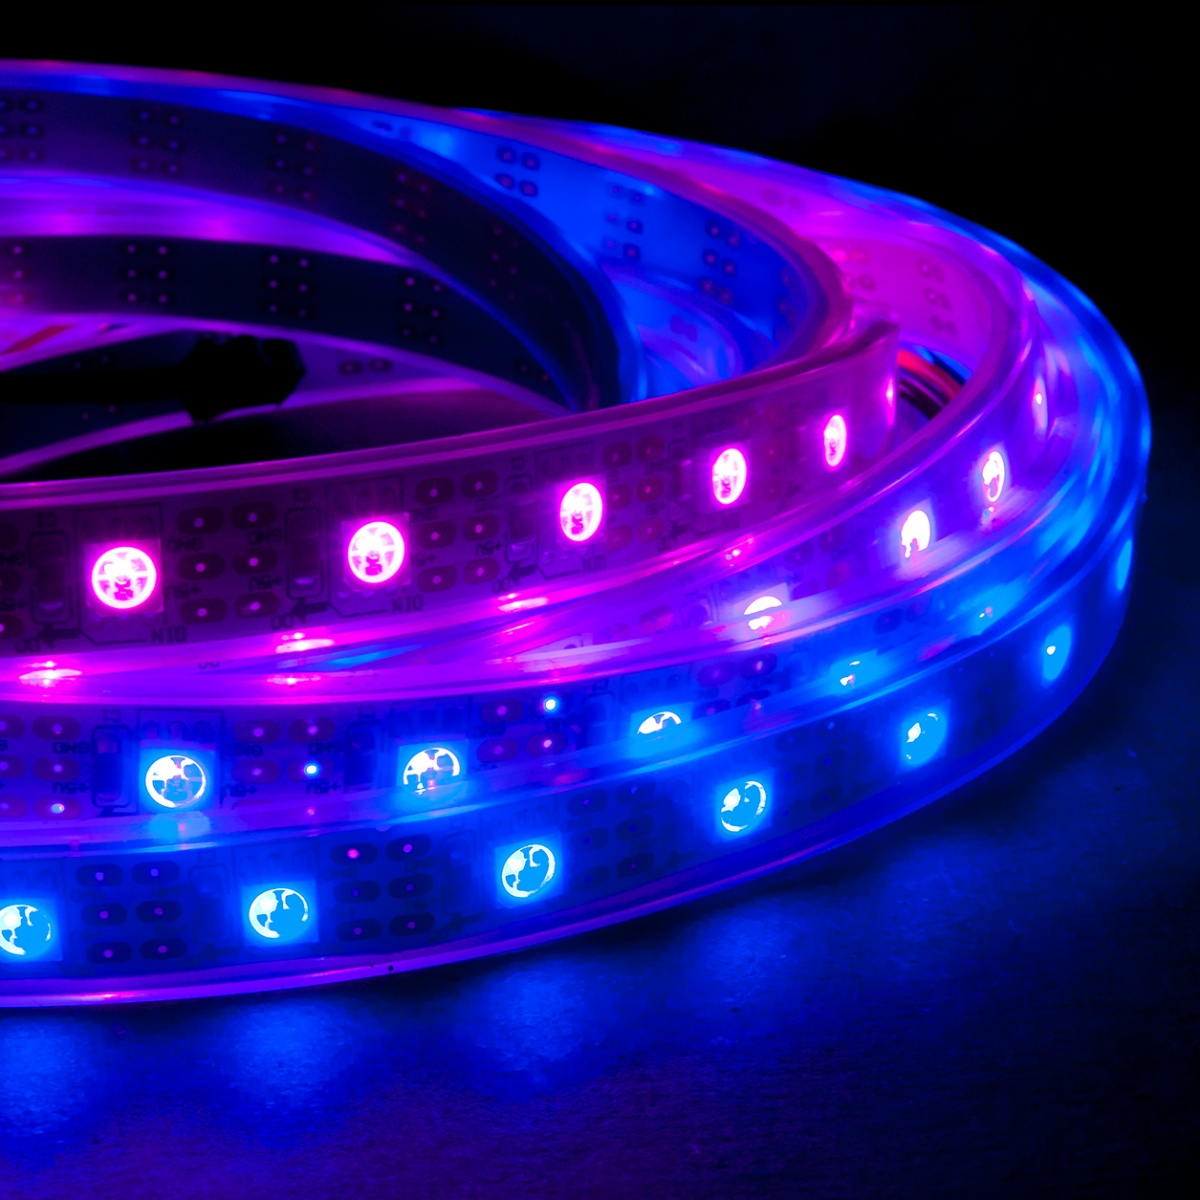 NooElec   1m Addressable 24 Bit RGB LED Strip, IP68 Waterproof, WS2812B  (WS2811), 60 Pixels Per Meter